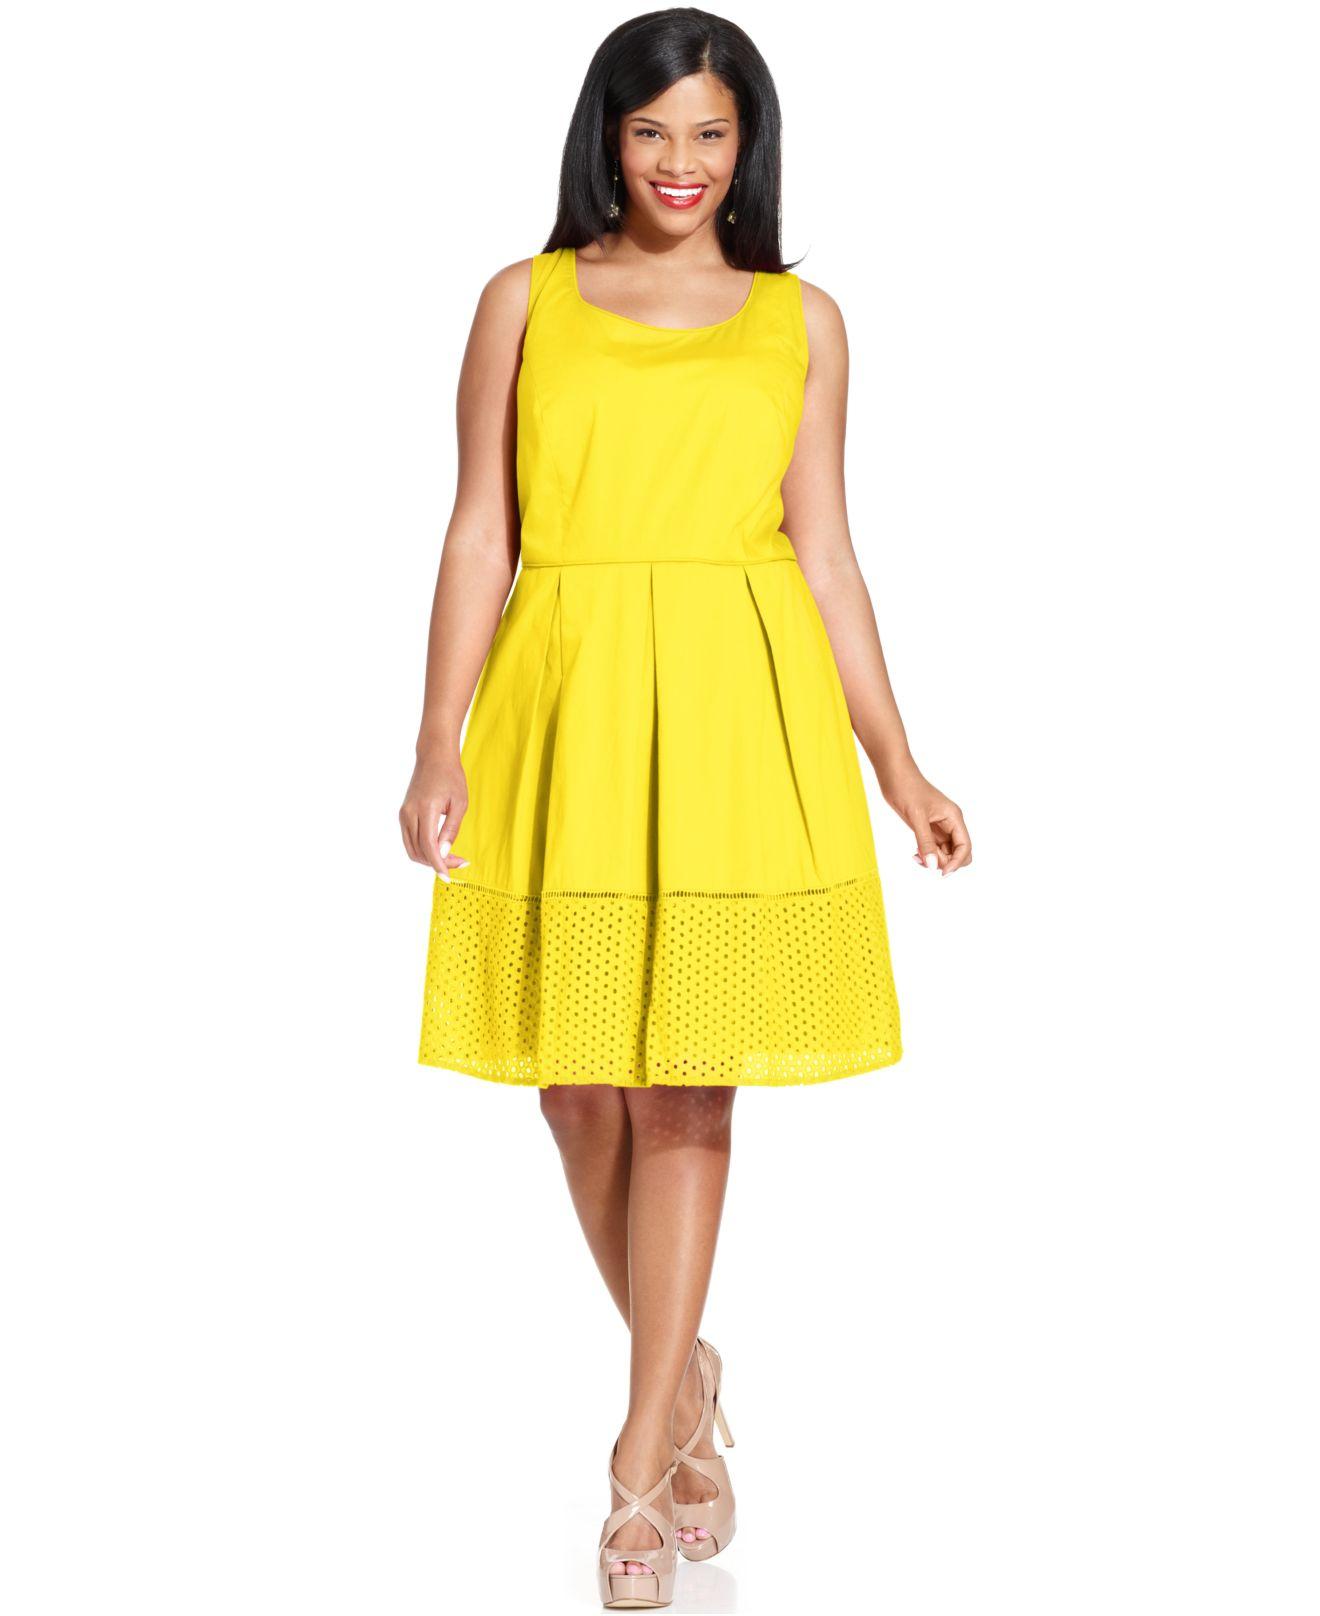 Spense Plus Size Sleeveless Pleated Eyelet-Hem Dress in Yellow - Lyst